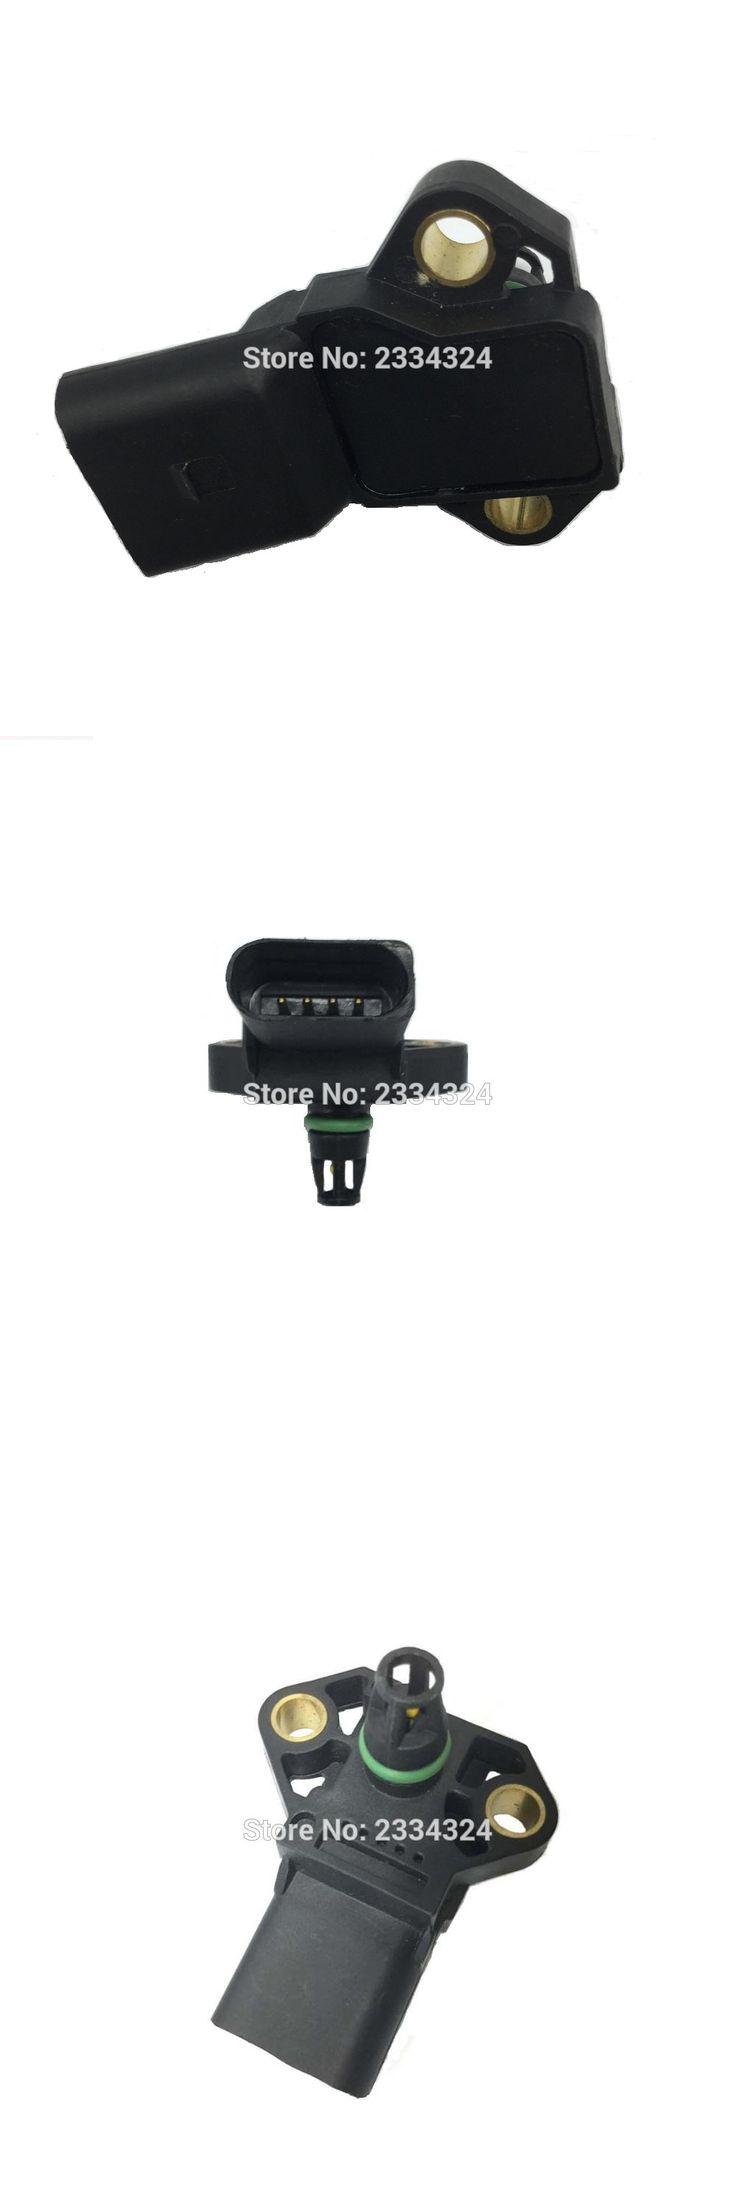 Pressure Sensor MAP For Audi A1 A2 A3 A4 A6 S6 A8 Seat Alhambra Altea Cordoba Ibiza Leon Toledo 1.2 1.4 1.8 1.9 2.7 3.0 TSI/TDI